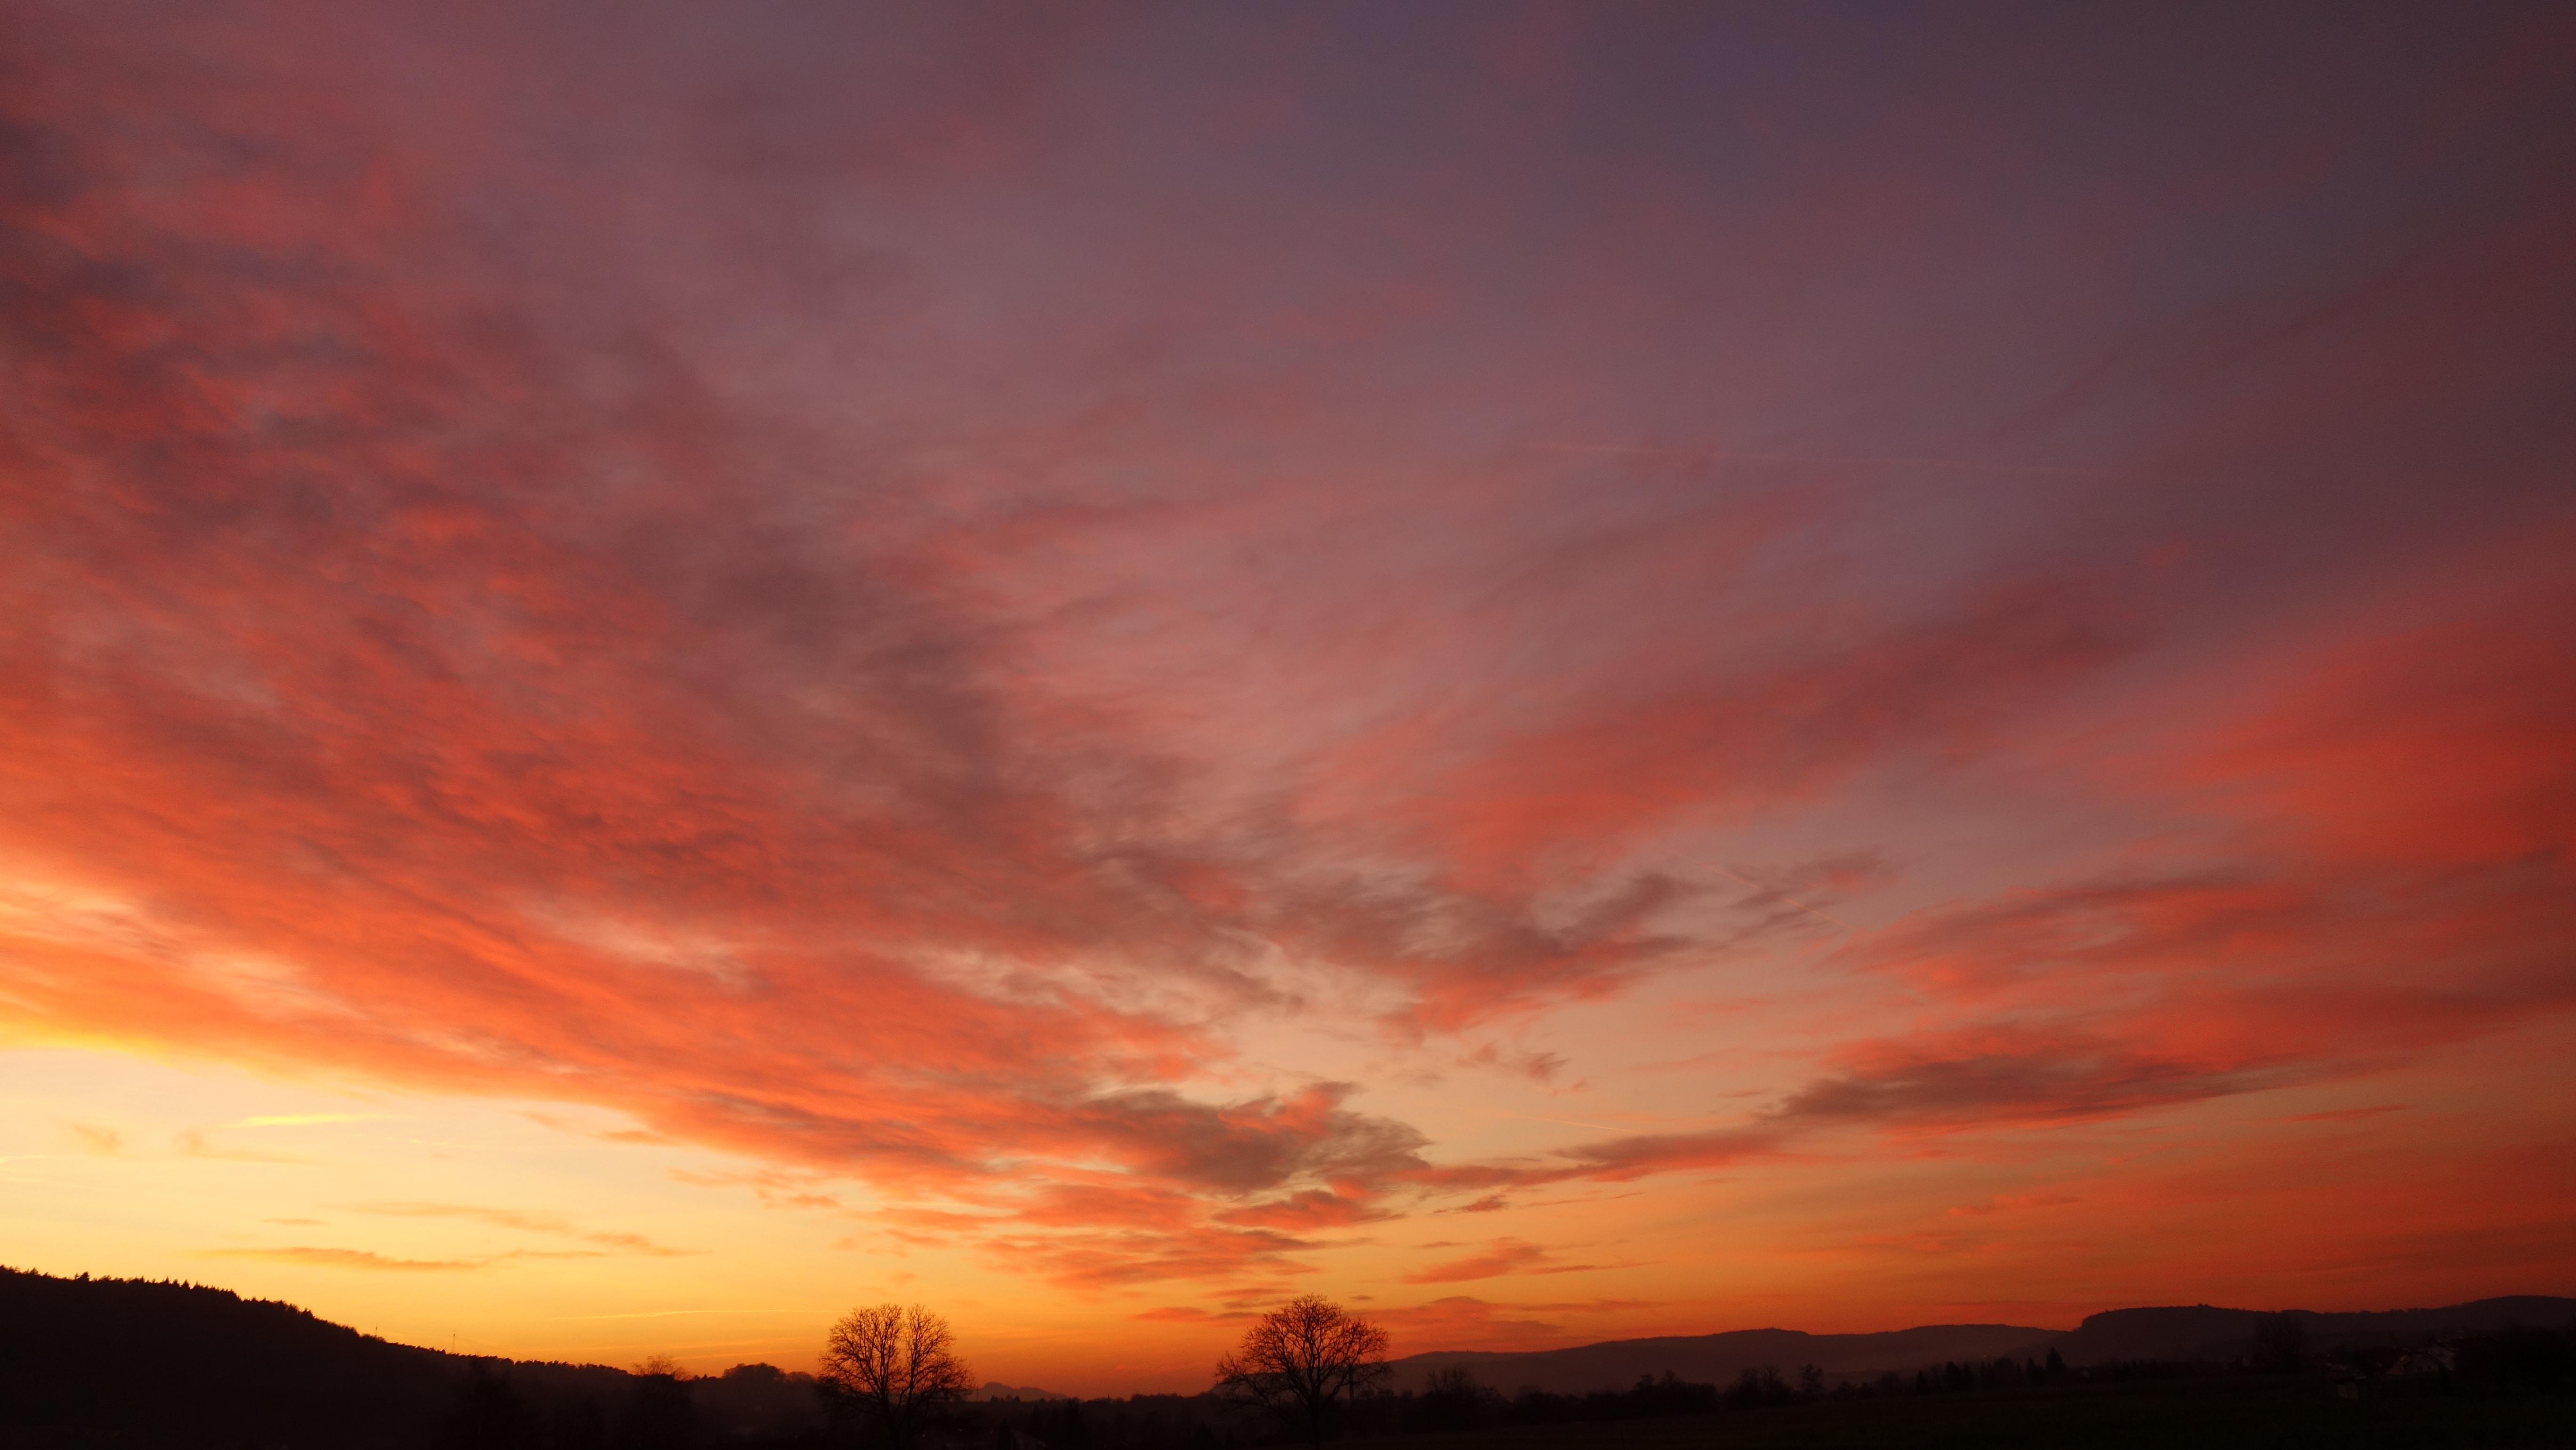 Love Wallpaper Iphone X Orange Sunset 183 Free Stock Photo